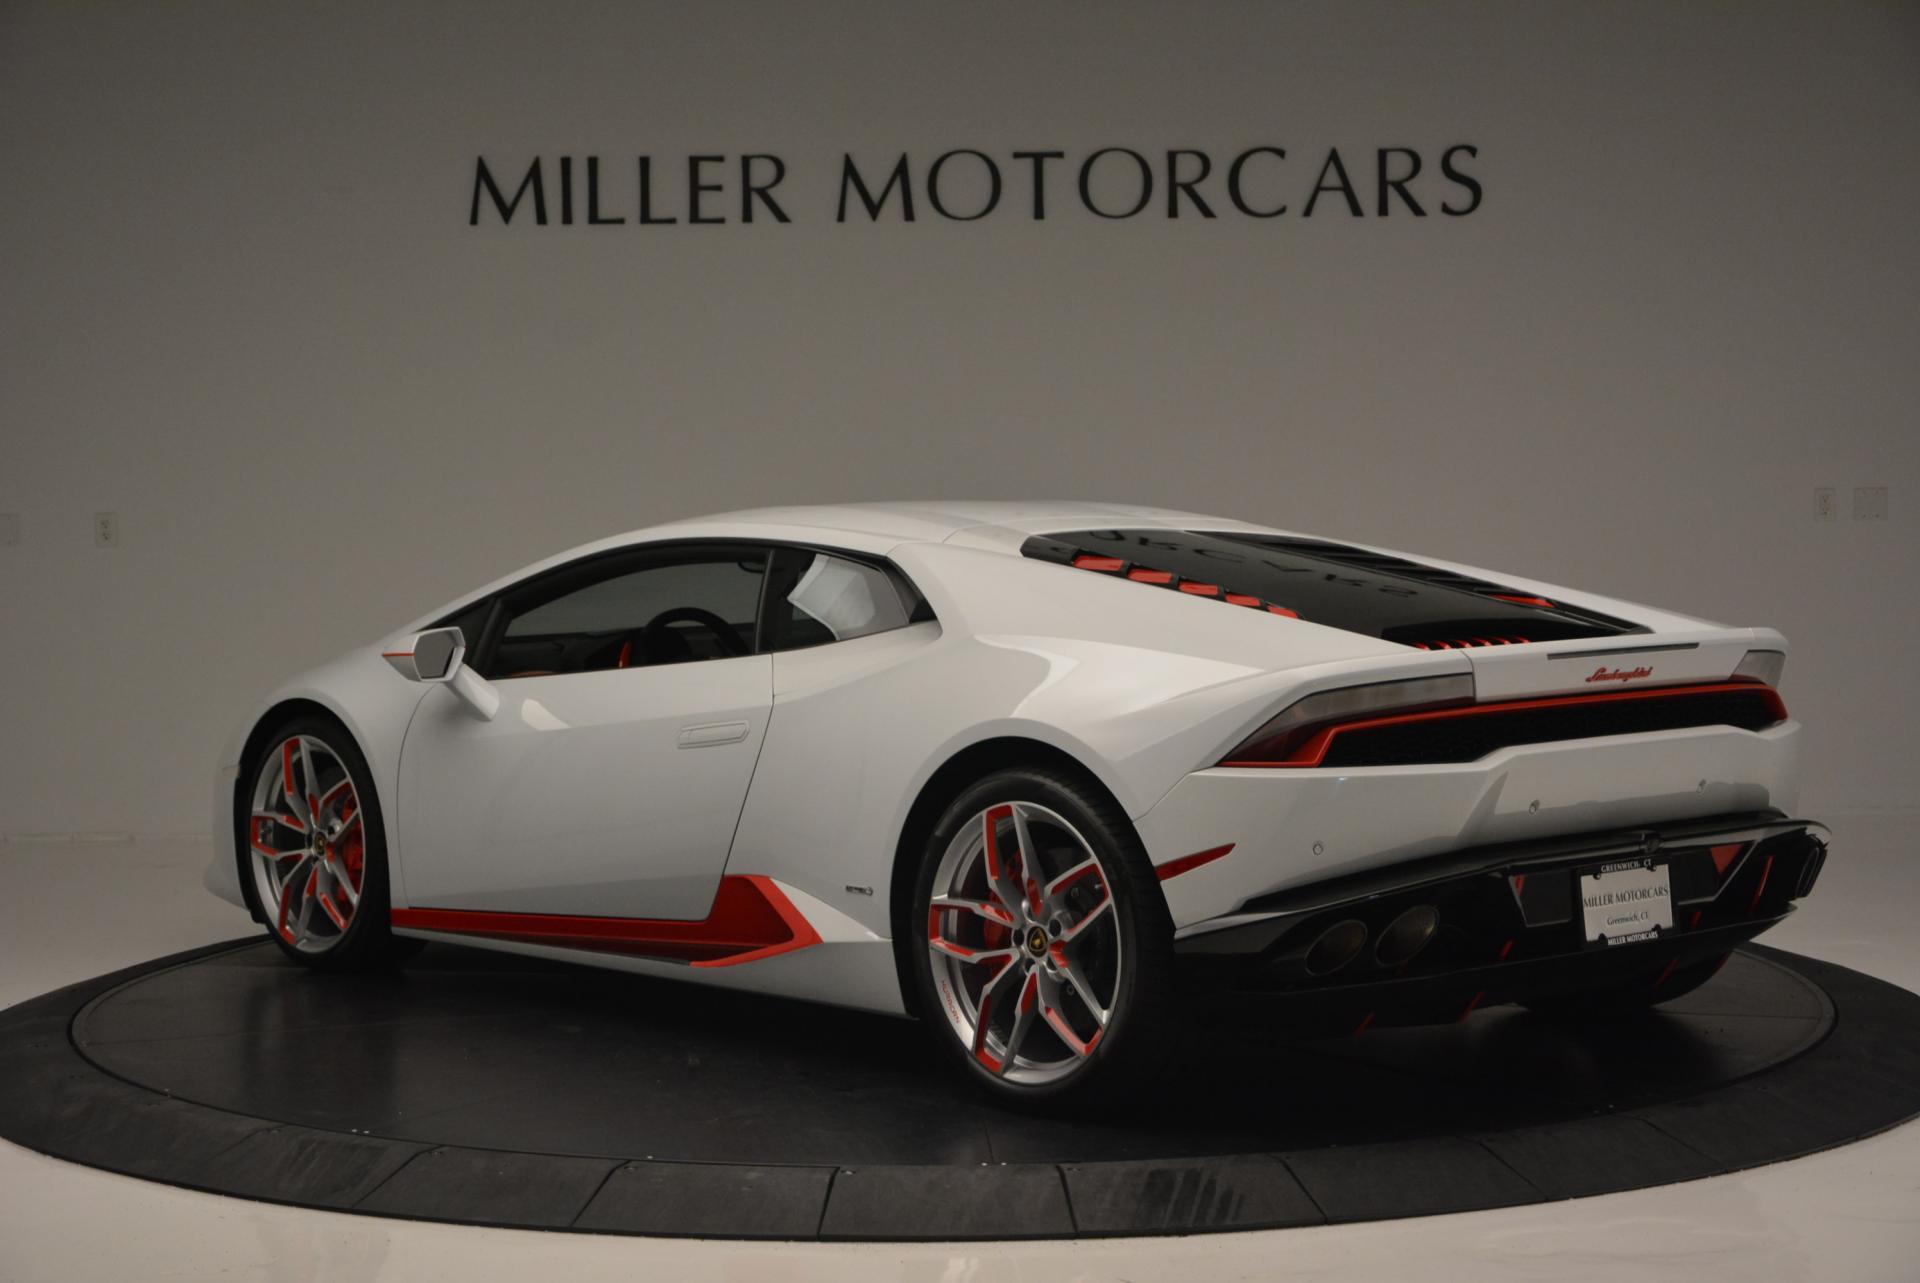 Used 2015 Lamborghini Huracan LP610-4 For Sale In Greenwich, CT. Alfa Romeo of Greenwich, F1707A 114_p5